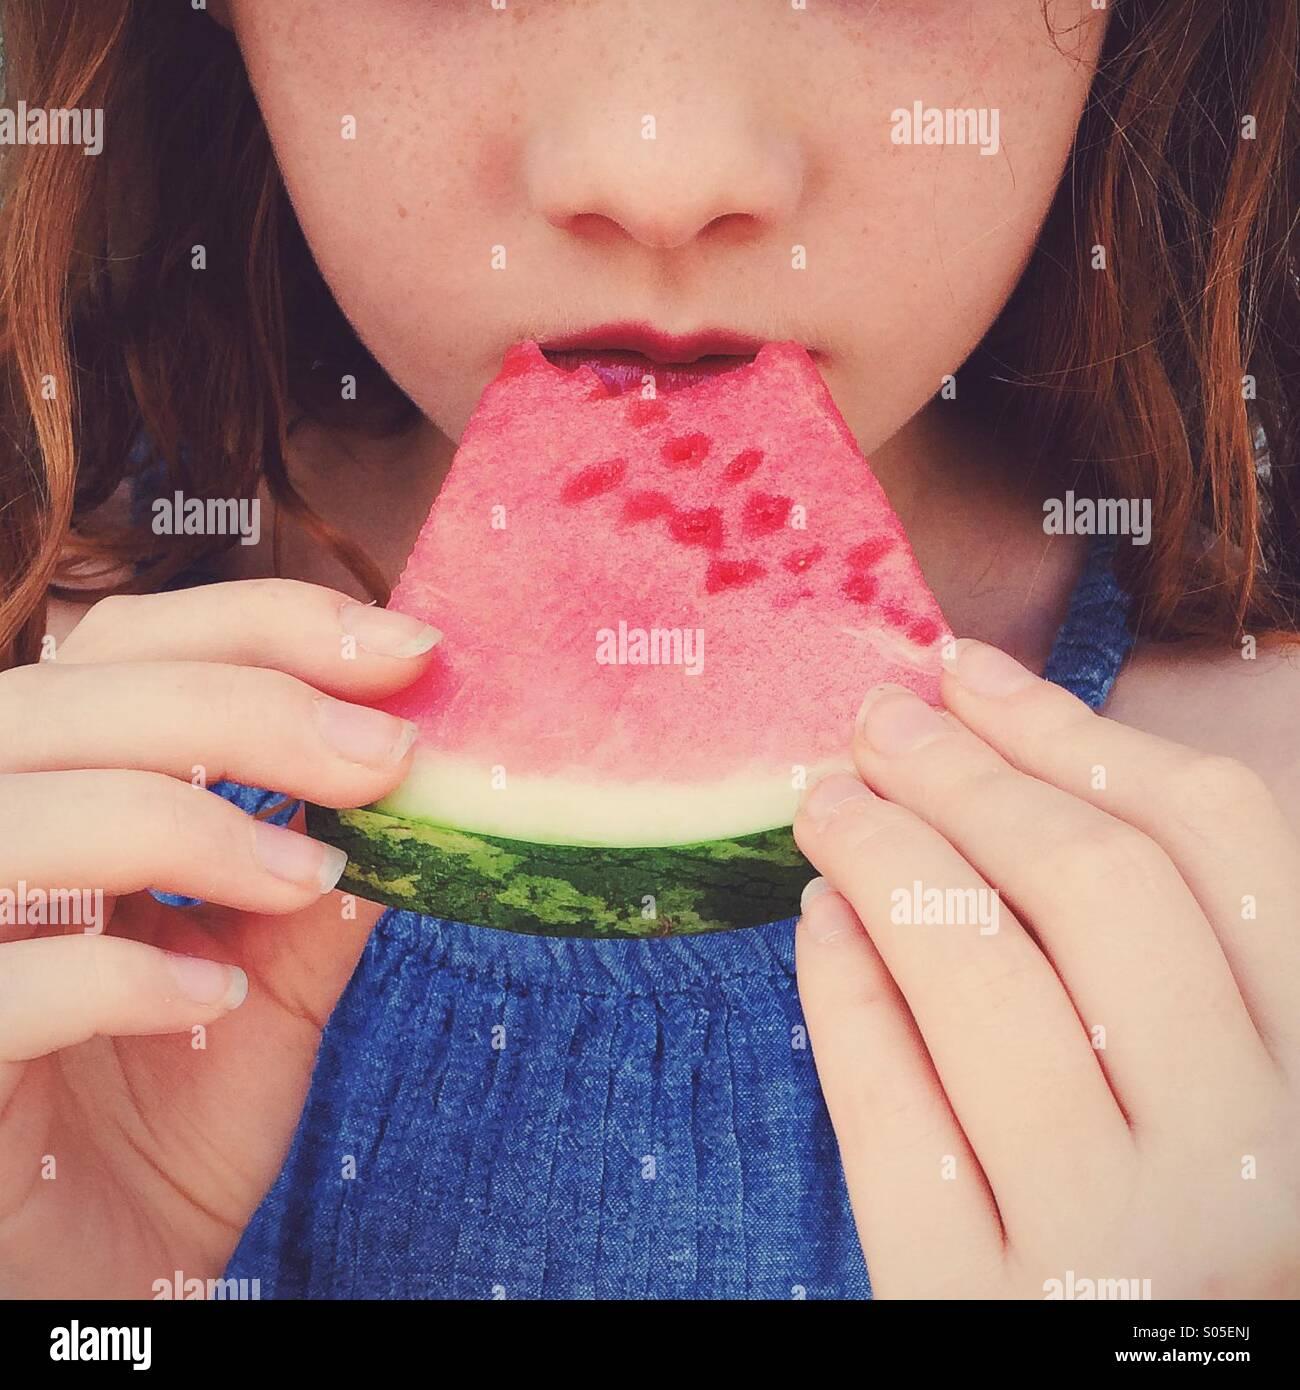 Girl eats watermelon. - Stock Image